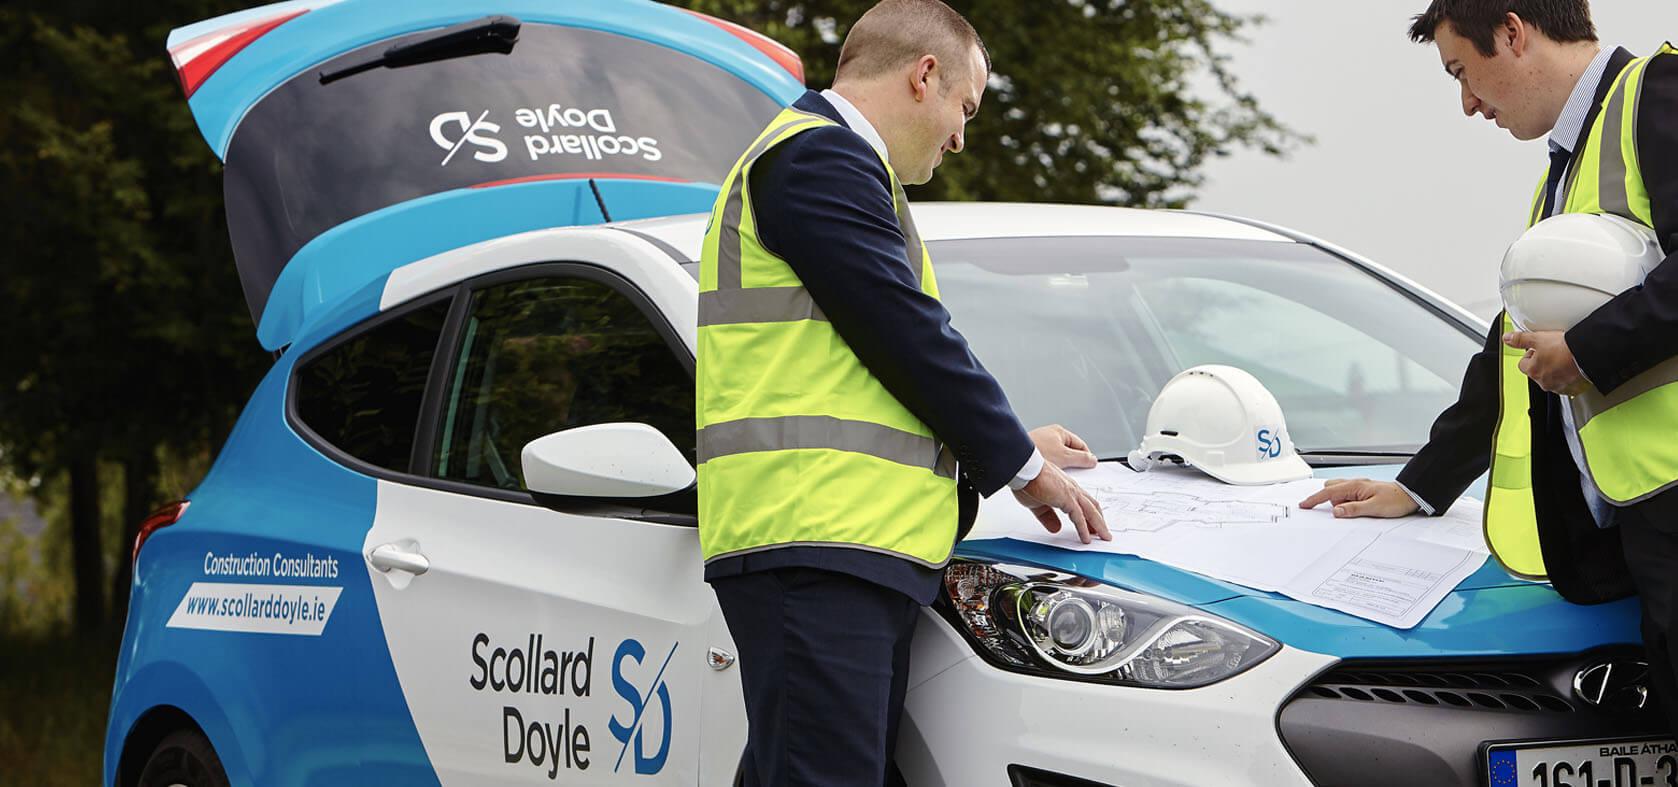 Corporate branding for scollard doyle using a creative branding solution